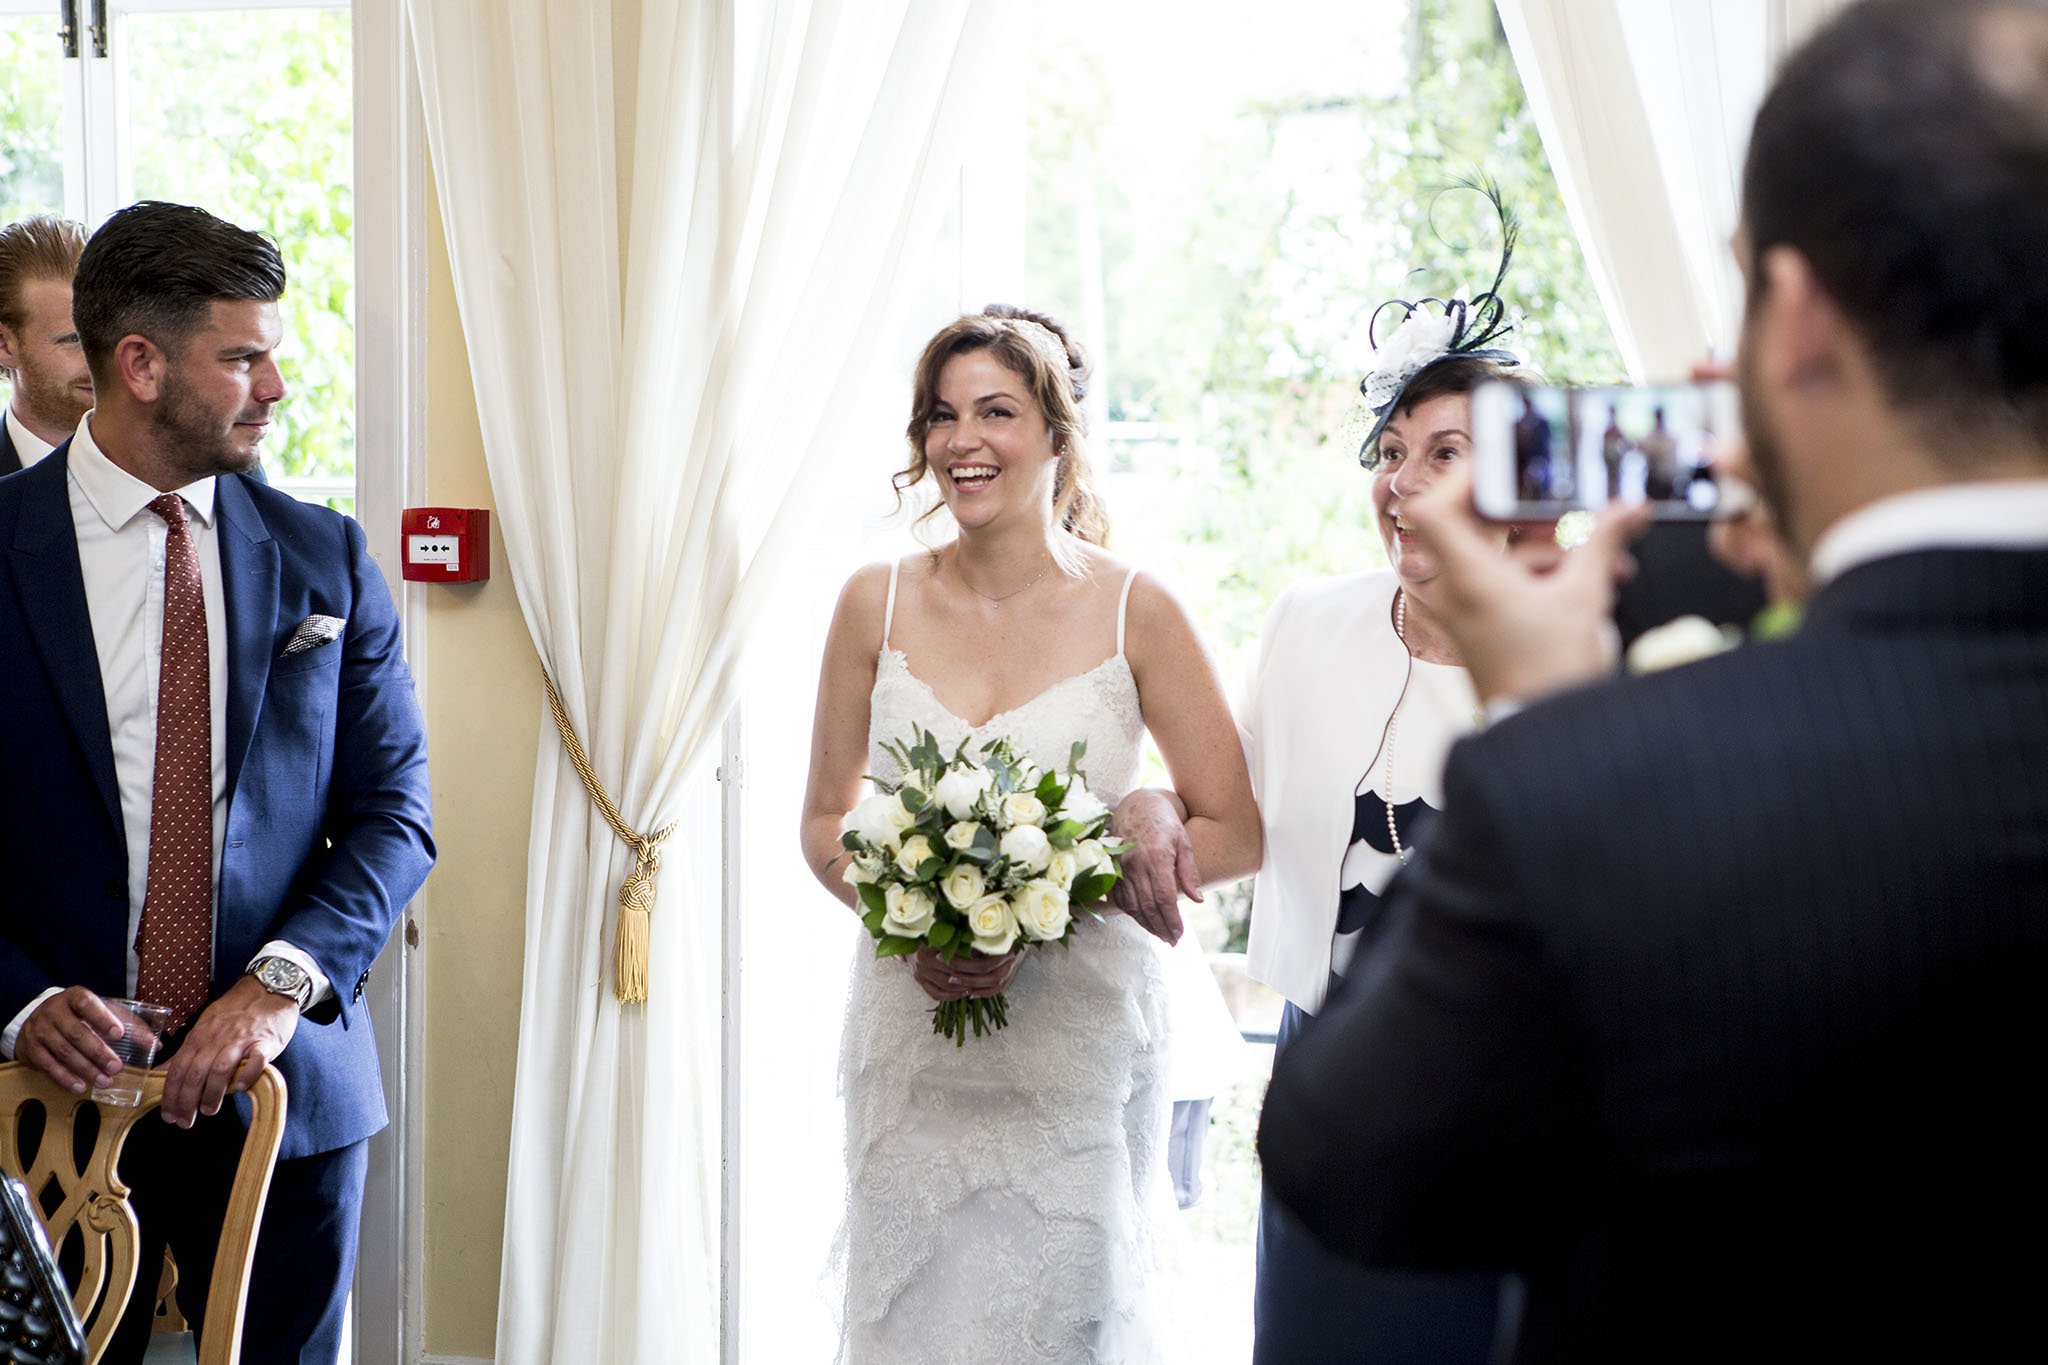 elizabethgphotography_kingslangley_hertfordshire_fineart_wedding_enfield_ricky_nicole_nahlis_16.jpg